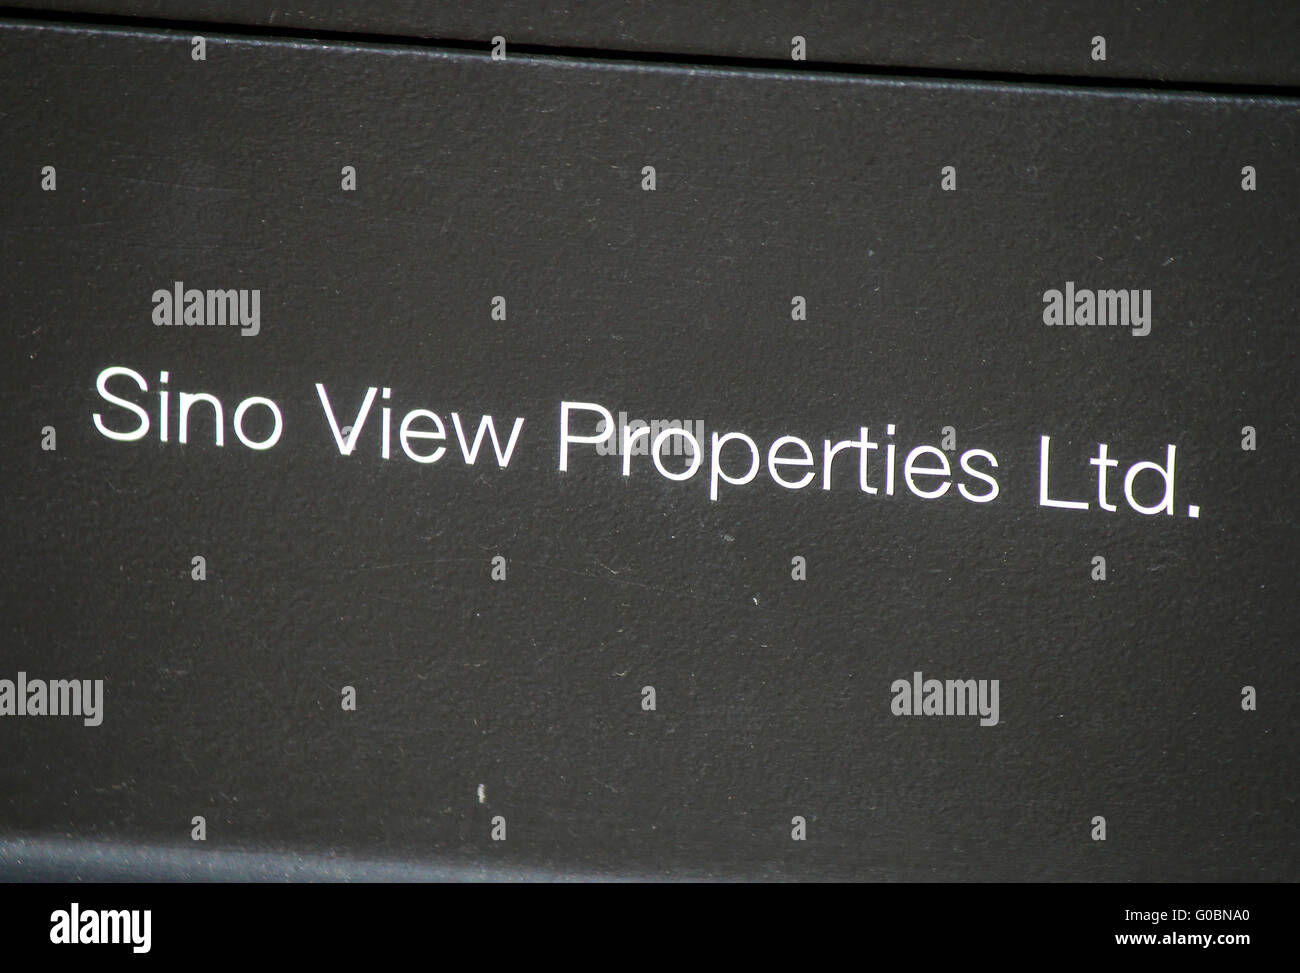 das Logo der Marke 'Sino View Properties', Berlin. - Stock Image